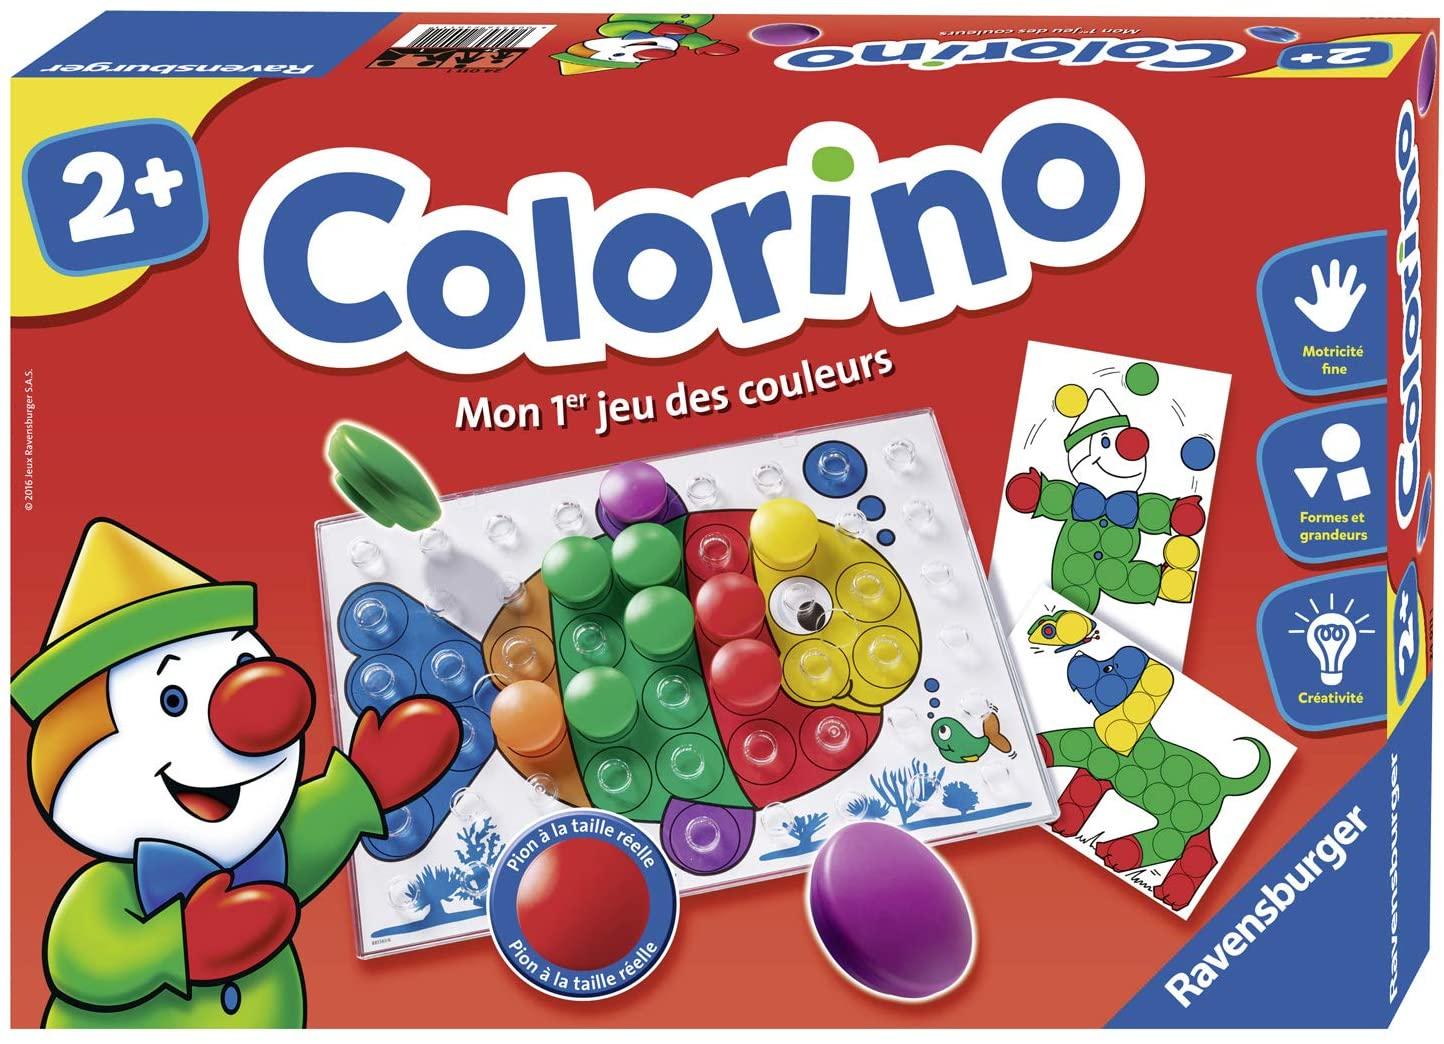 2290 - Colorino Image